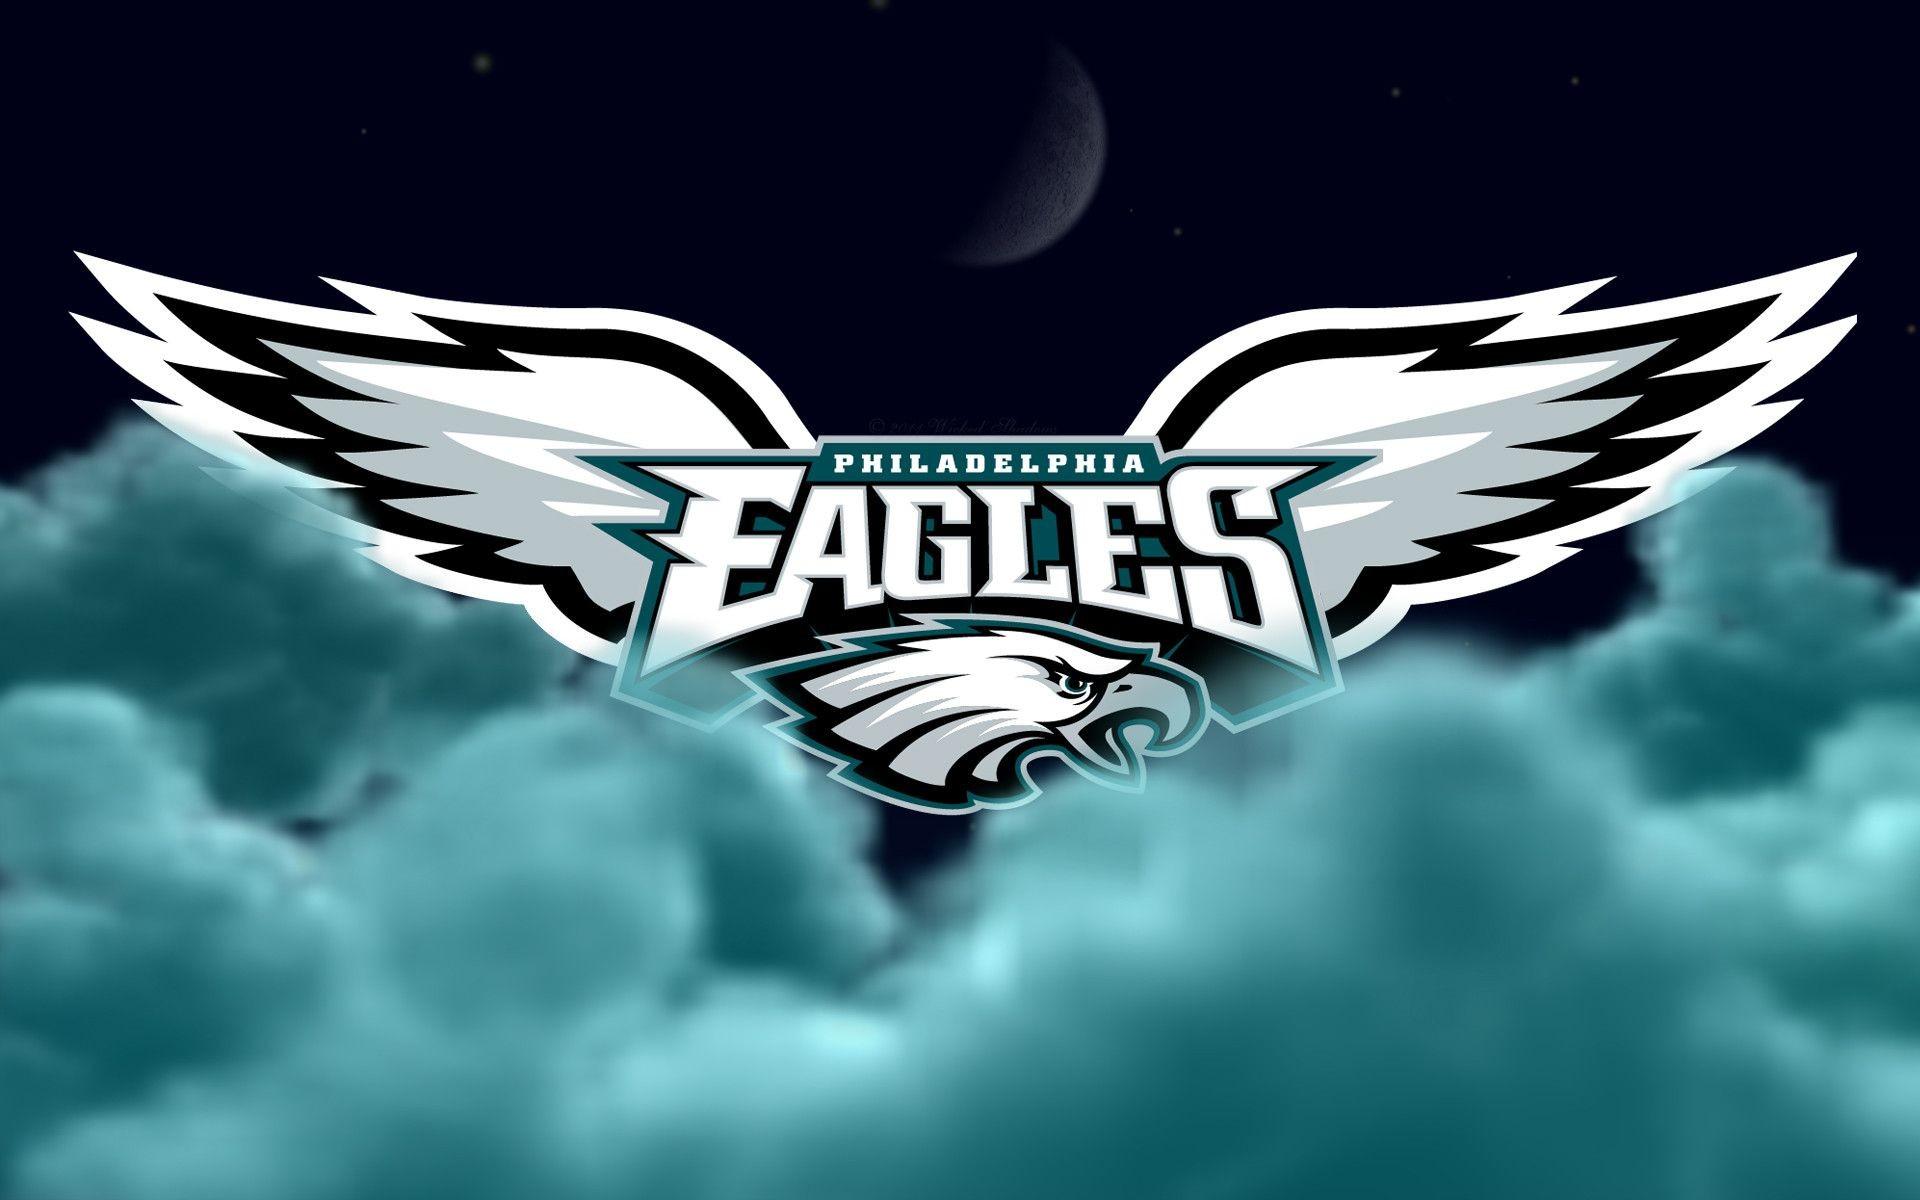 Free Philadelphia Eagles Wallpapers Group | HD Wallpapers | Pinterest |  Wallpaper